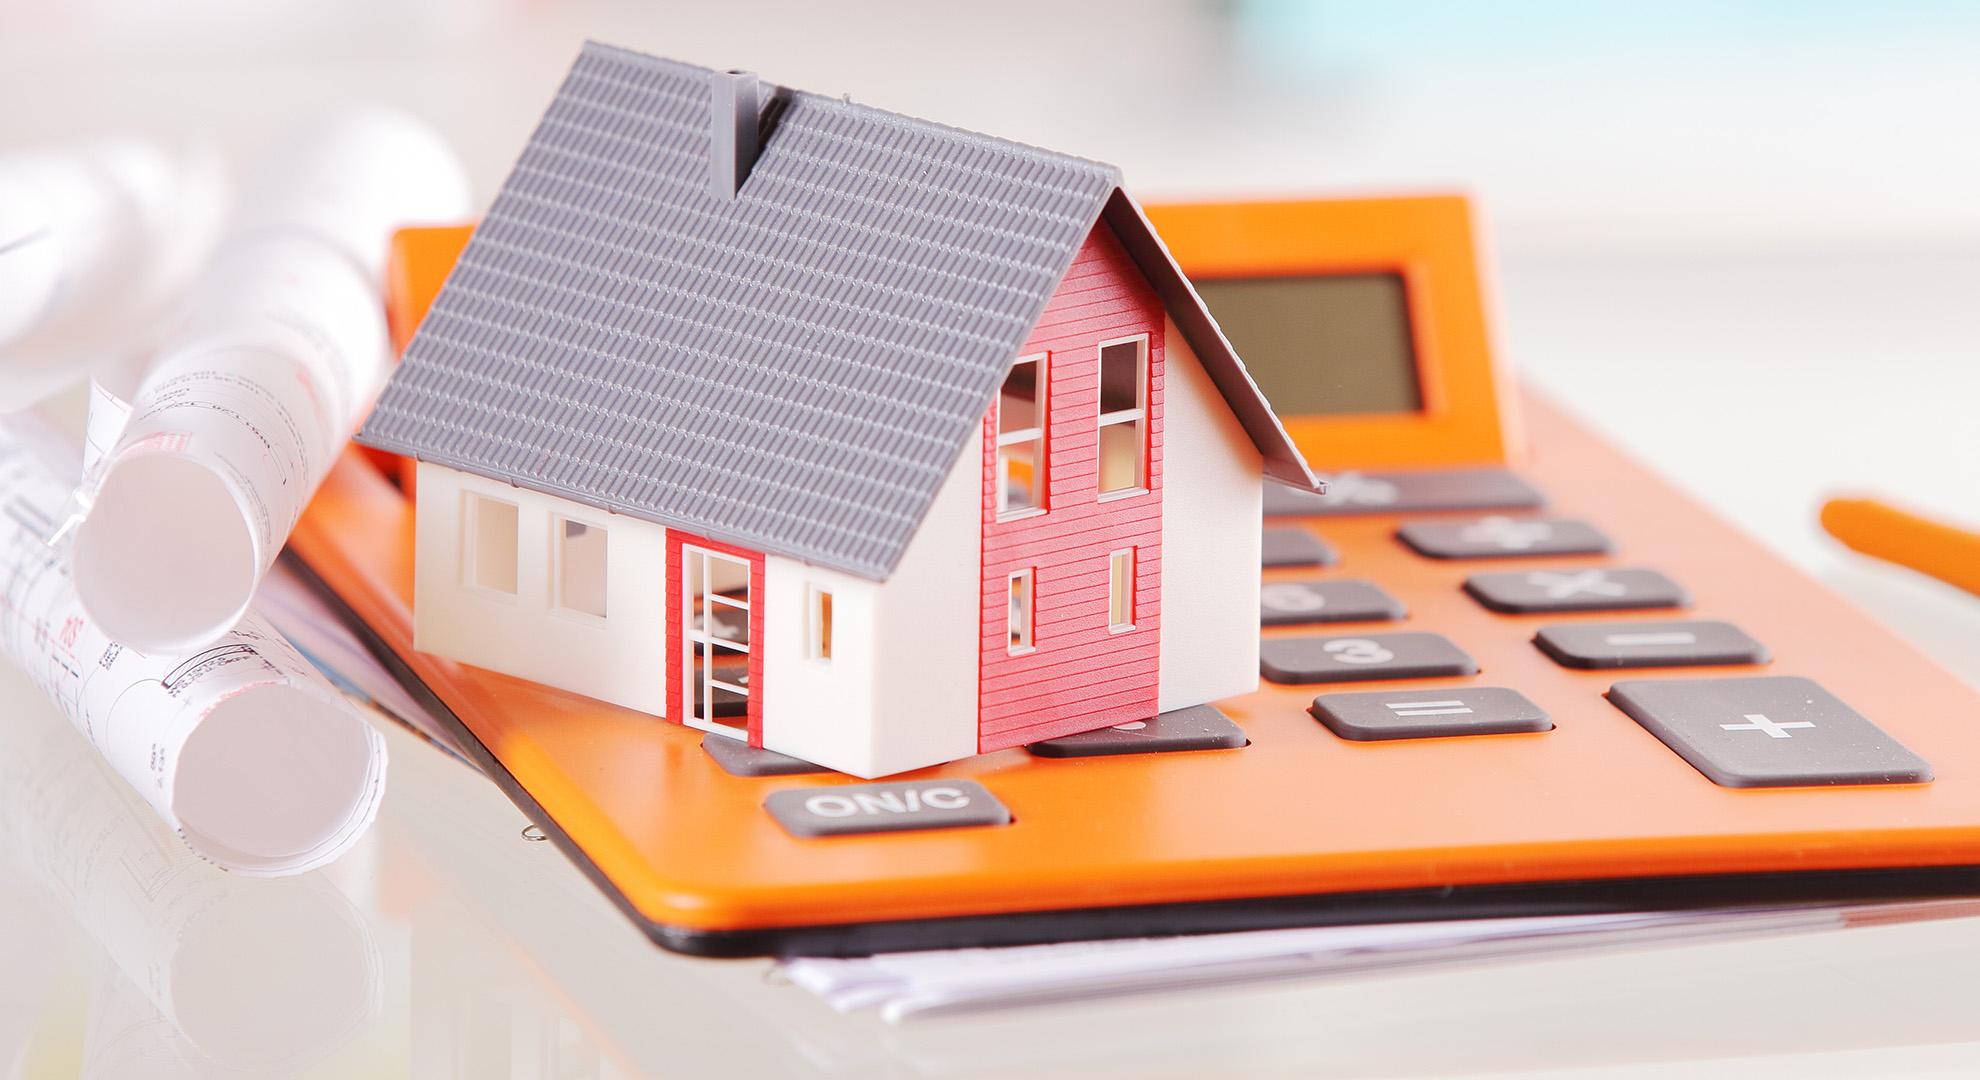 Premium housing builders enter affordable segment on Budget push